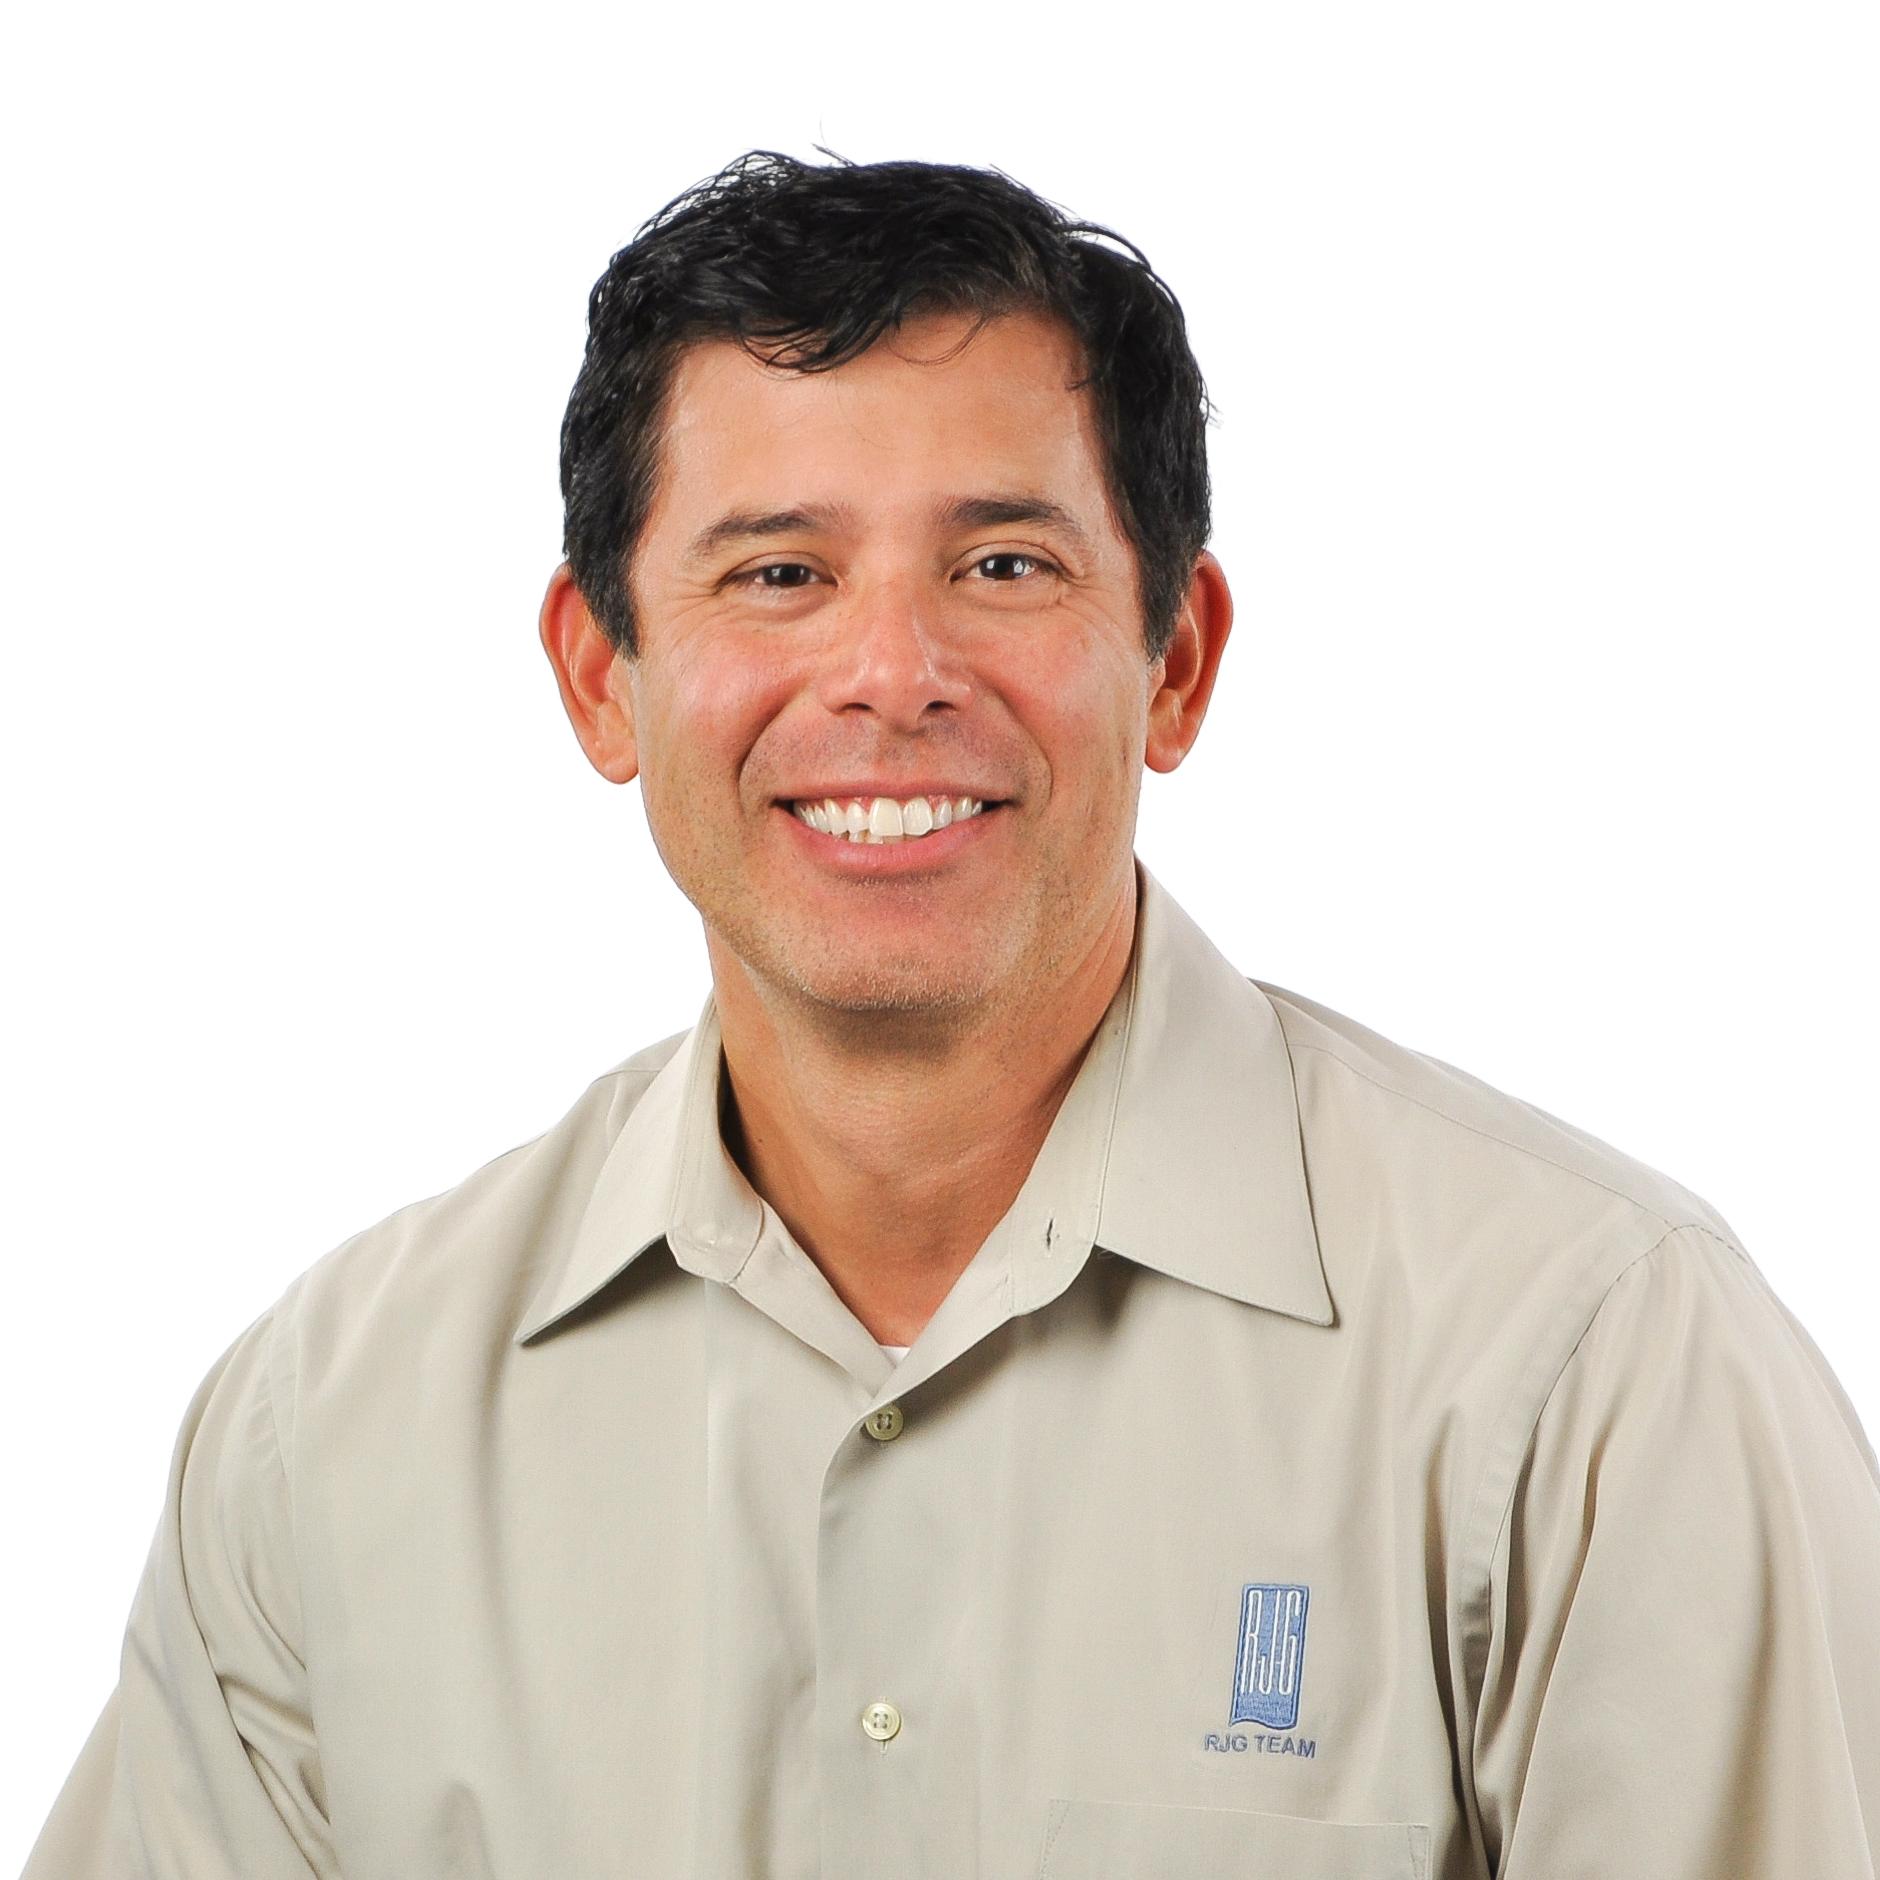 Doug Espinoza